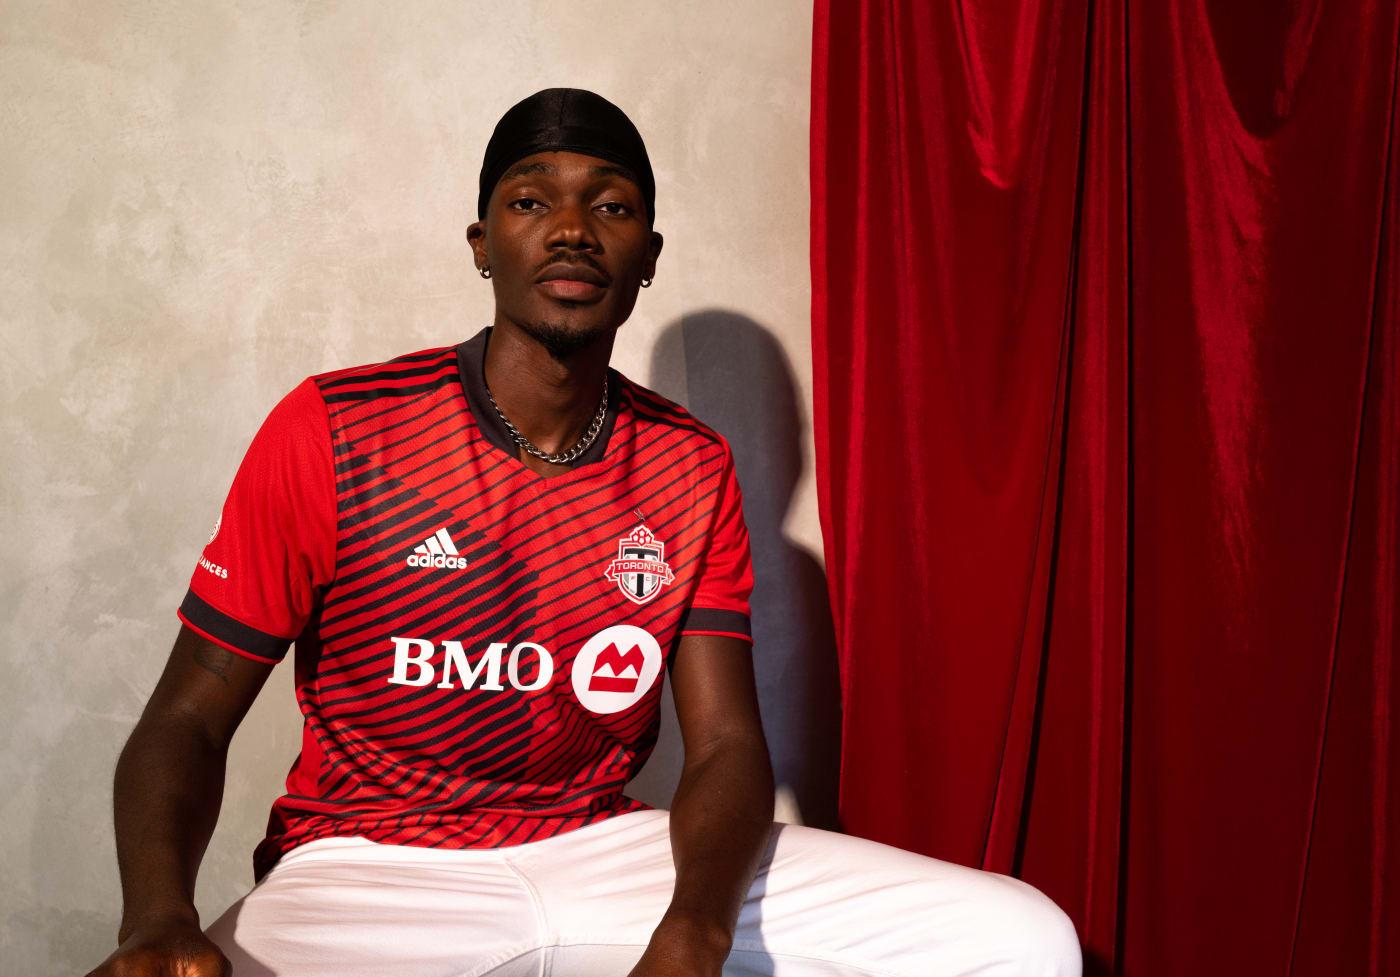 Tobi posting in a red Toronto FC jersey